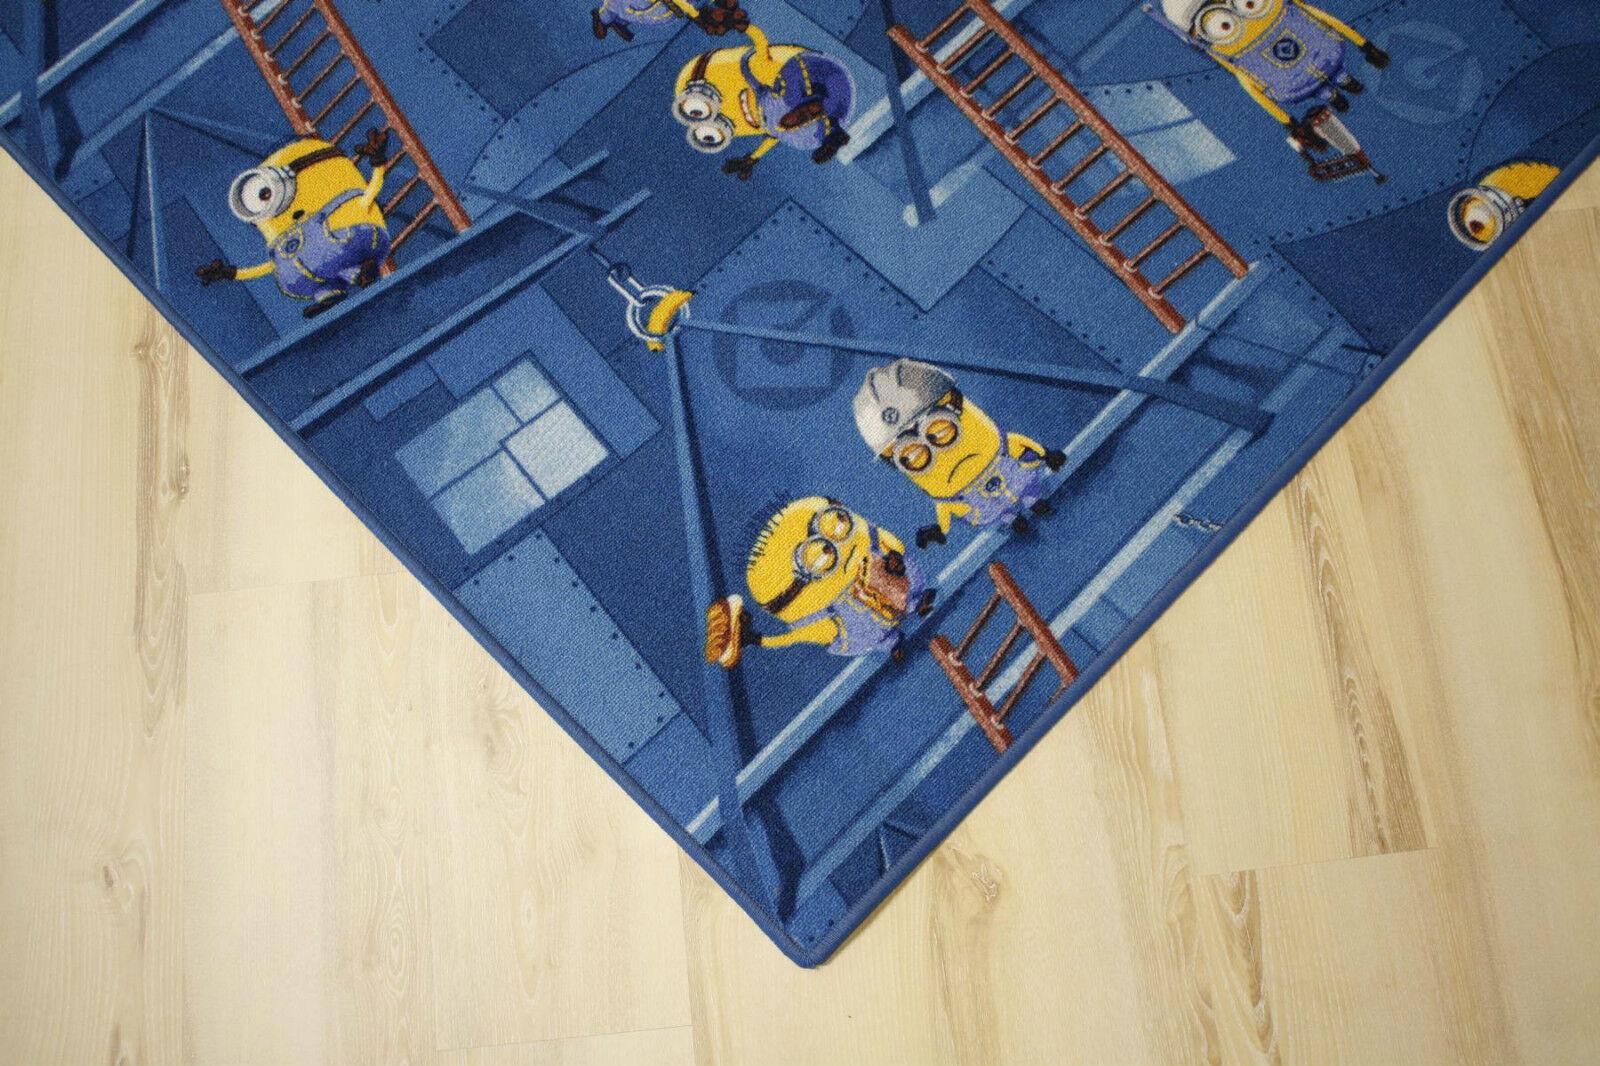 Enfants Tapis Tapis de jeu sbires bleu 400x250 cm NEUF